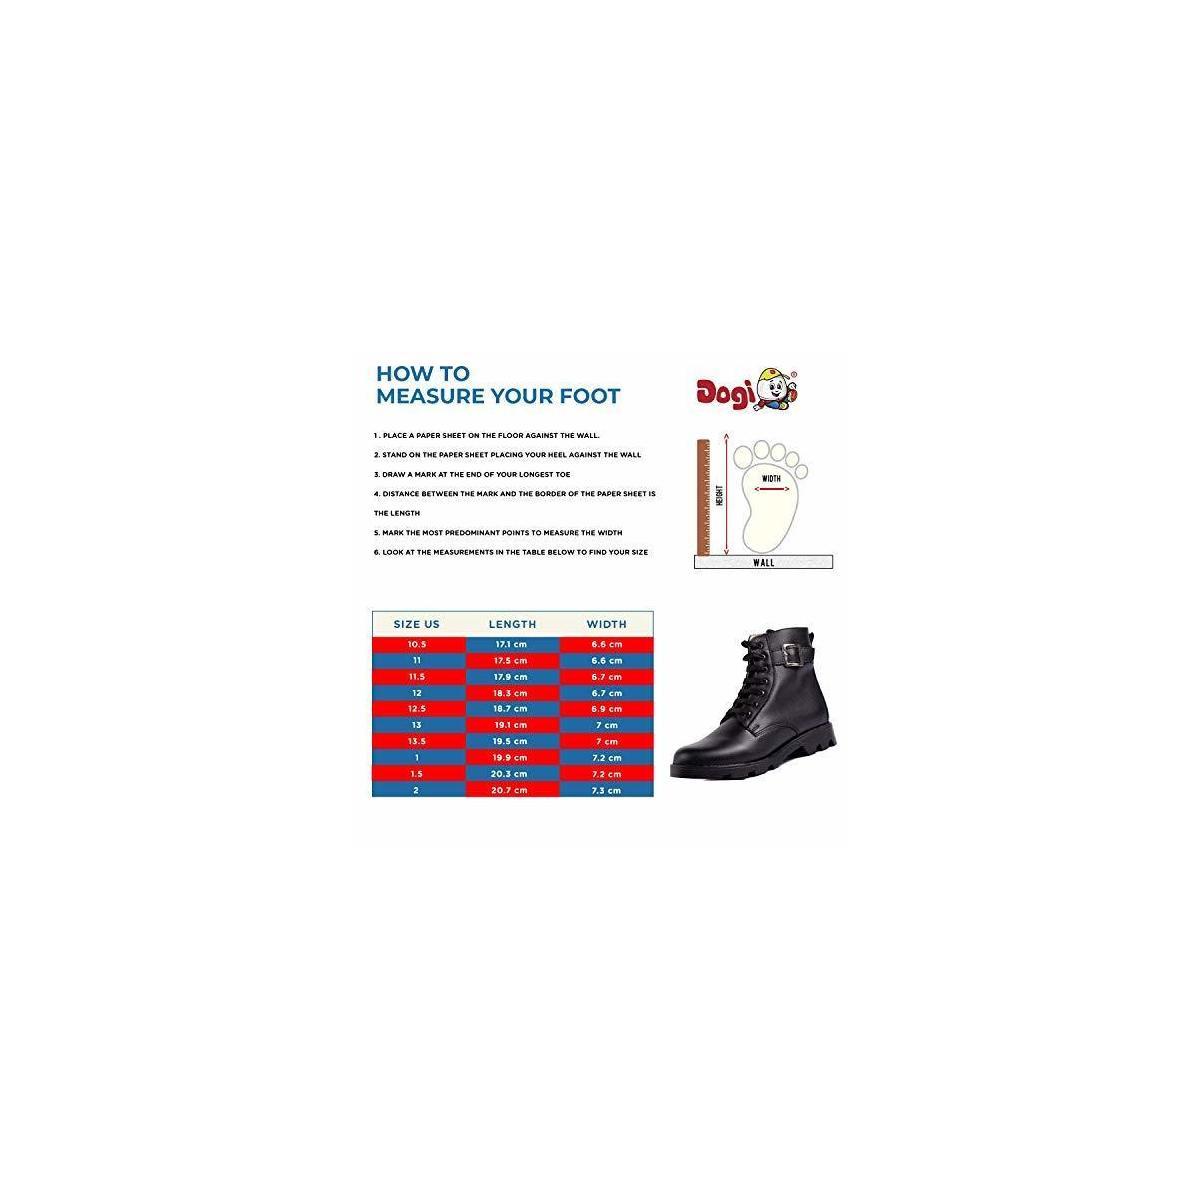 DOGI Girls Lace-Up Outdoor Boots - Premium Leather Combat Hiking Boot Rounded Plain Toe - Greta